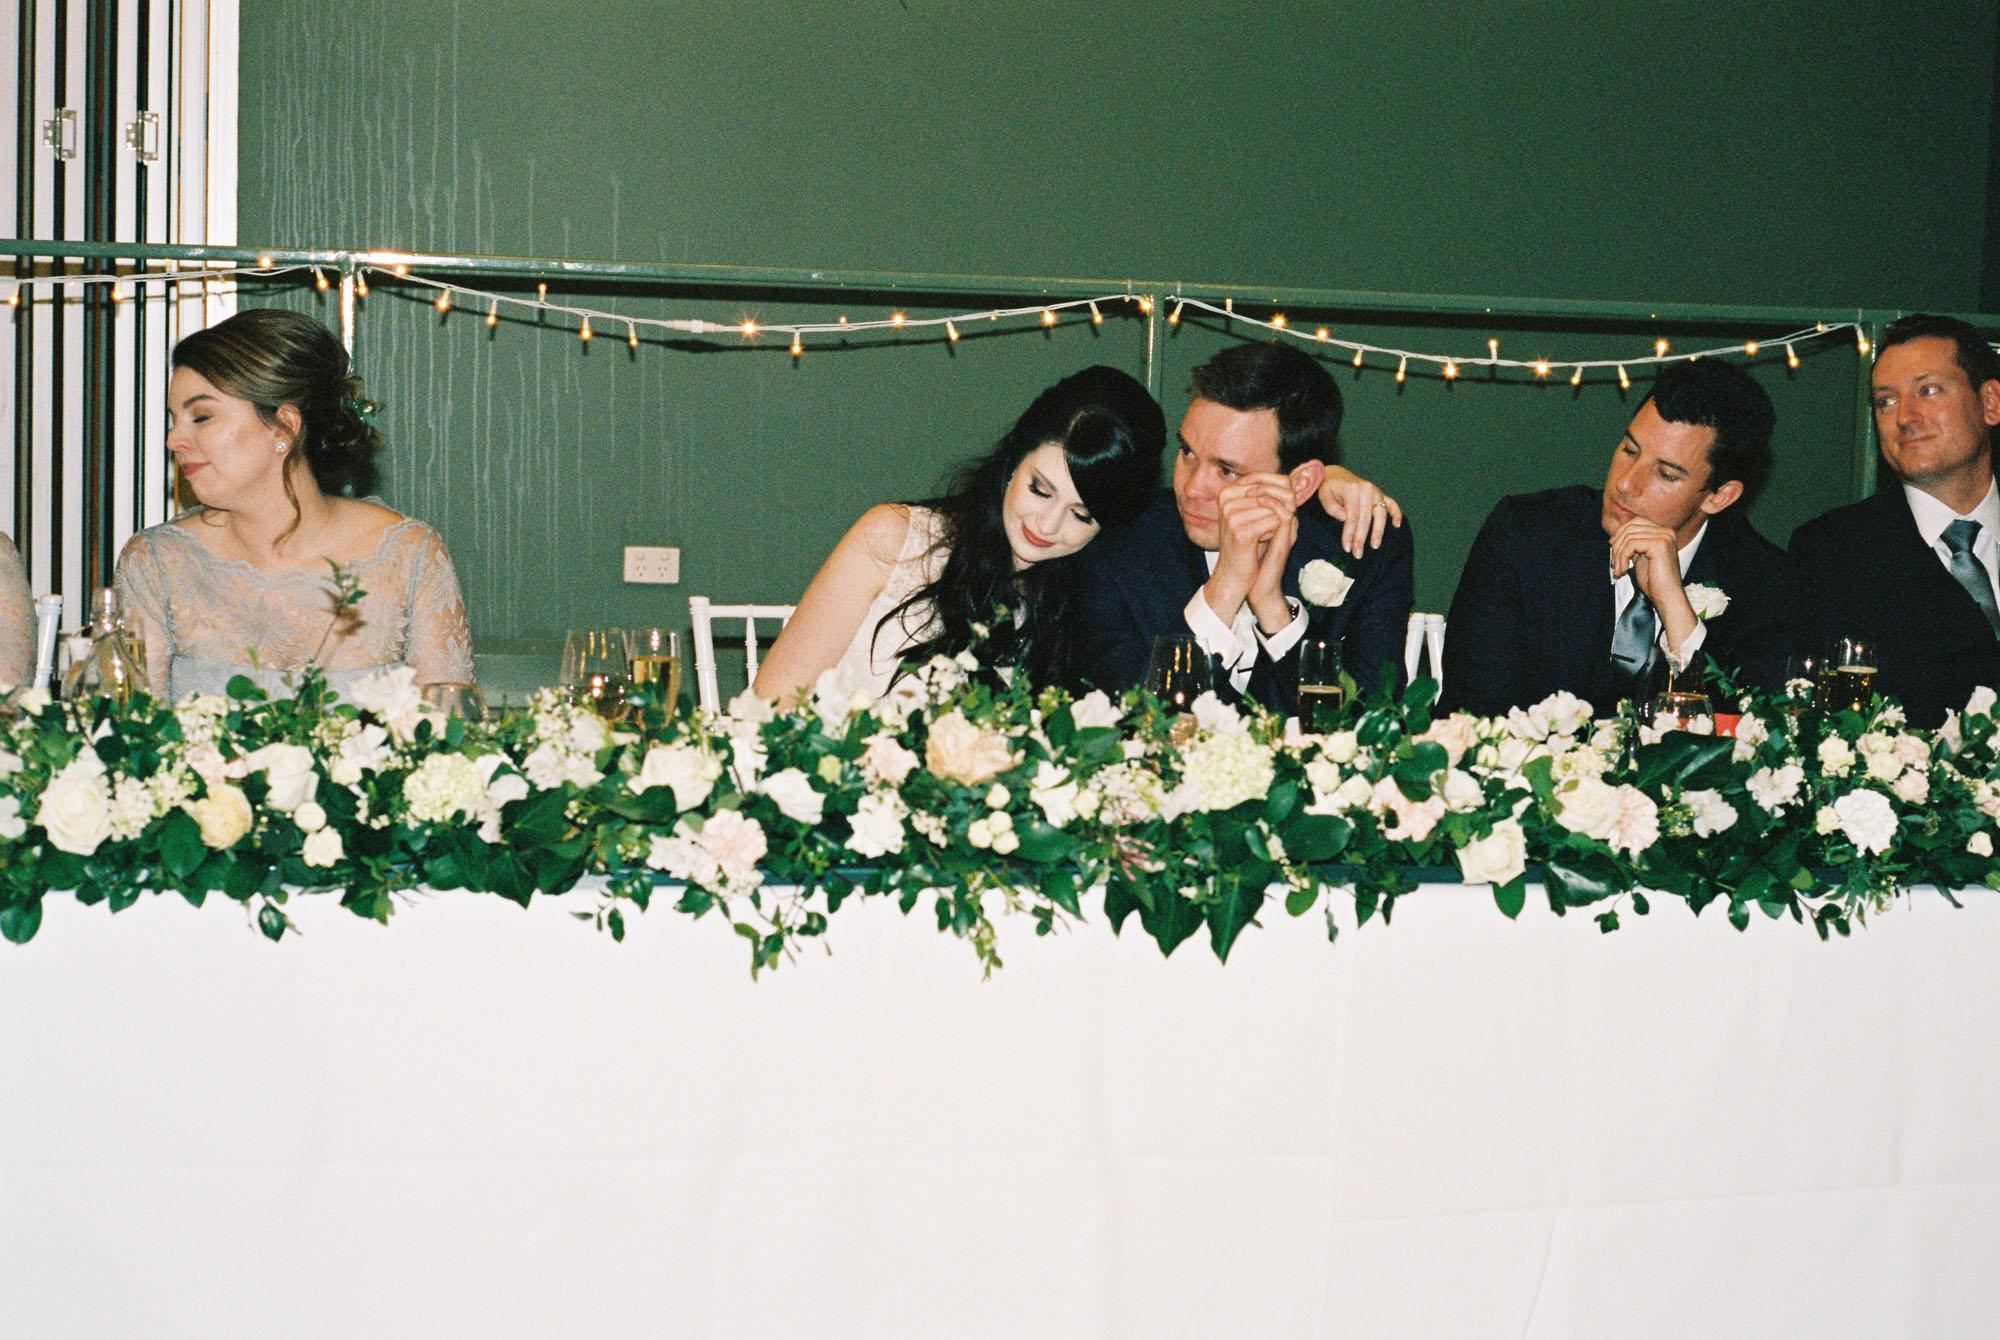 Glen-Ewin-Estate-wedding-photography-093.jpg